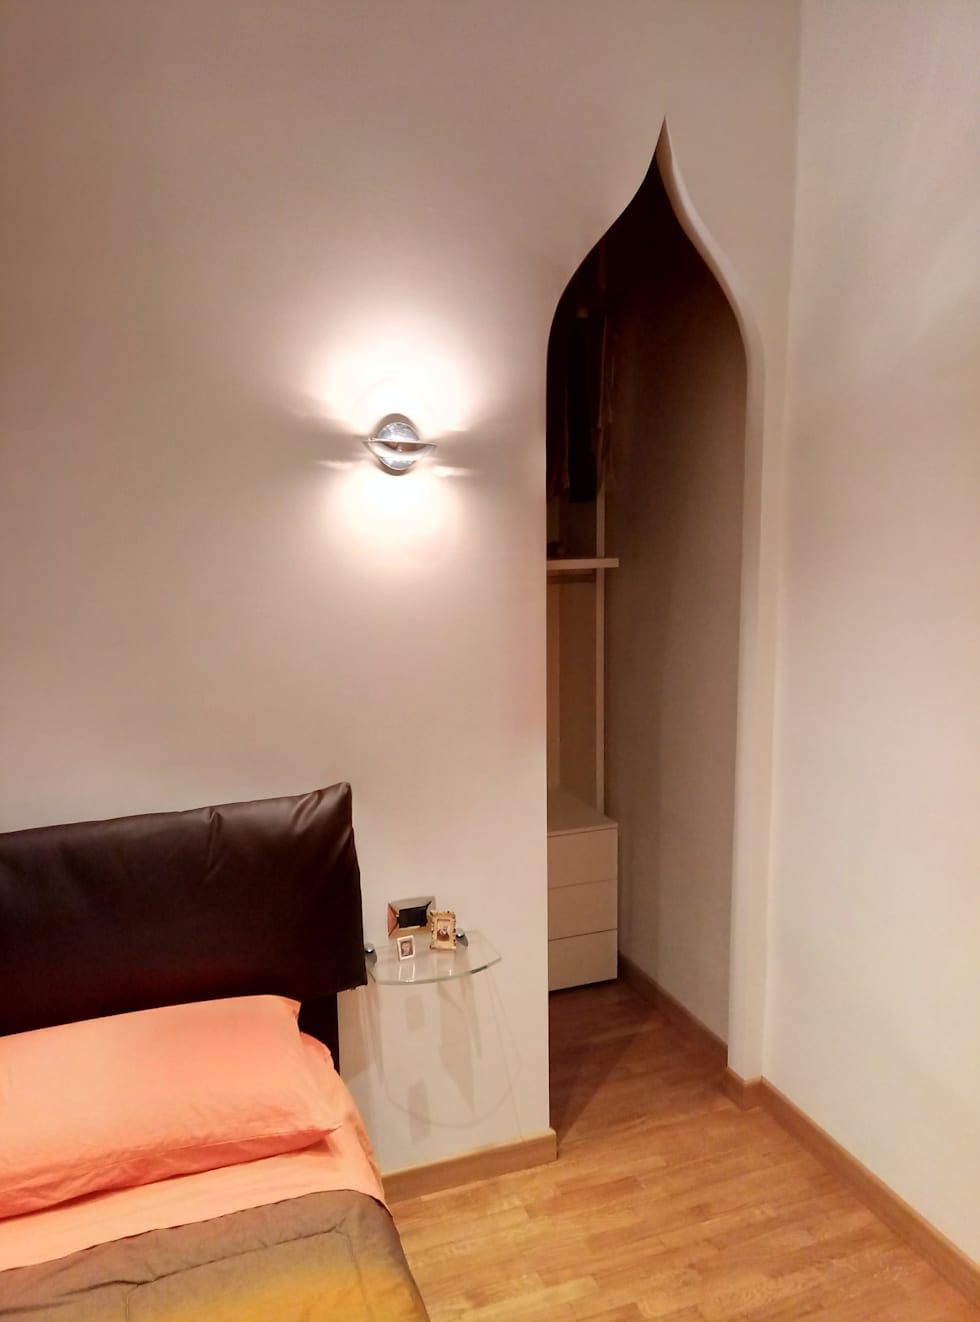 Fotos de decora o design de interiores e remodela es - Idee armadio camera da letto ...